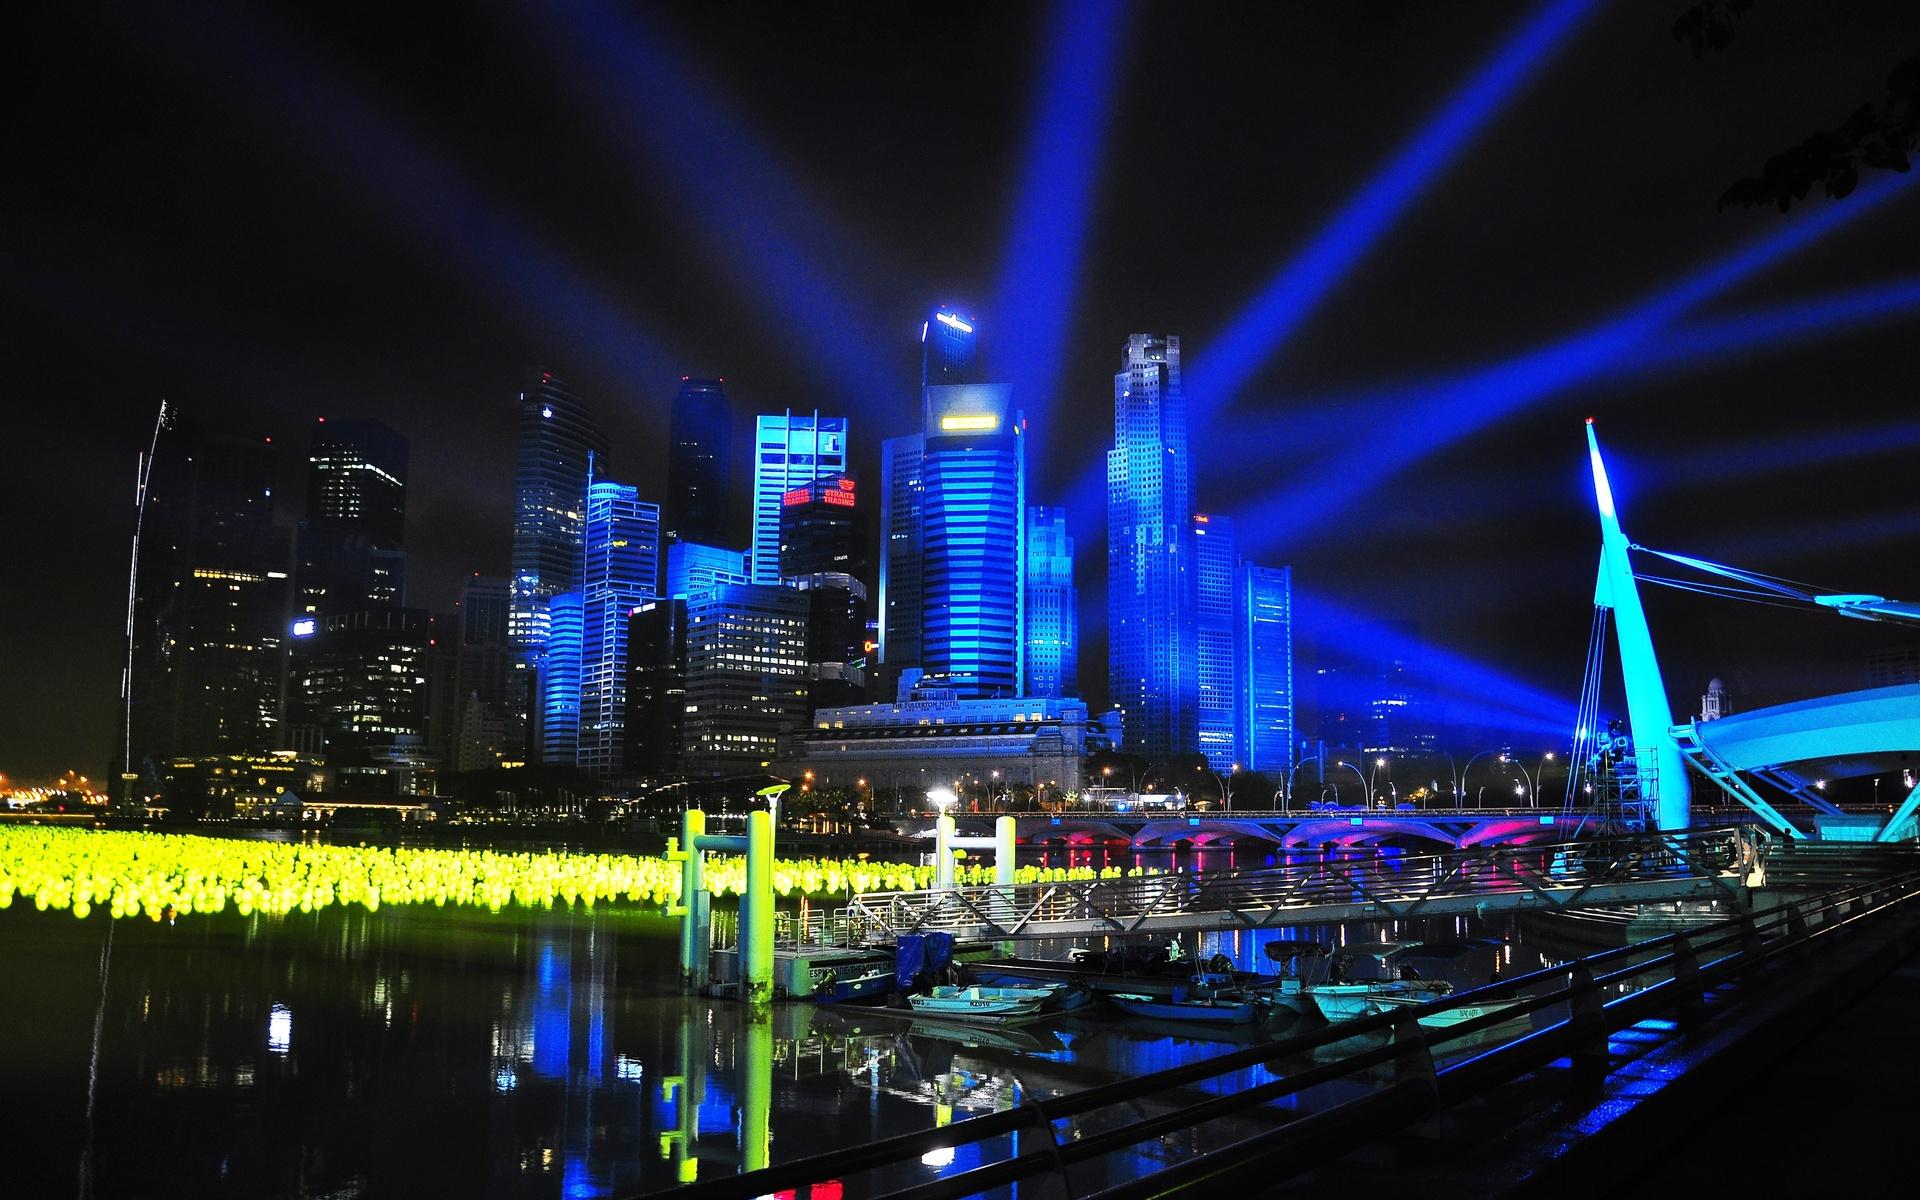 Singapore city night lights wallpaper 1920x1200 77664 - Night light city wallpaper ...